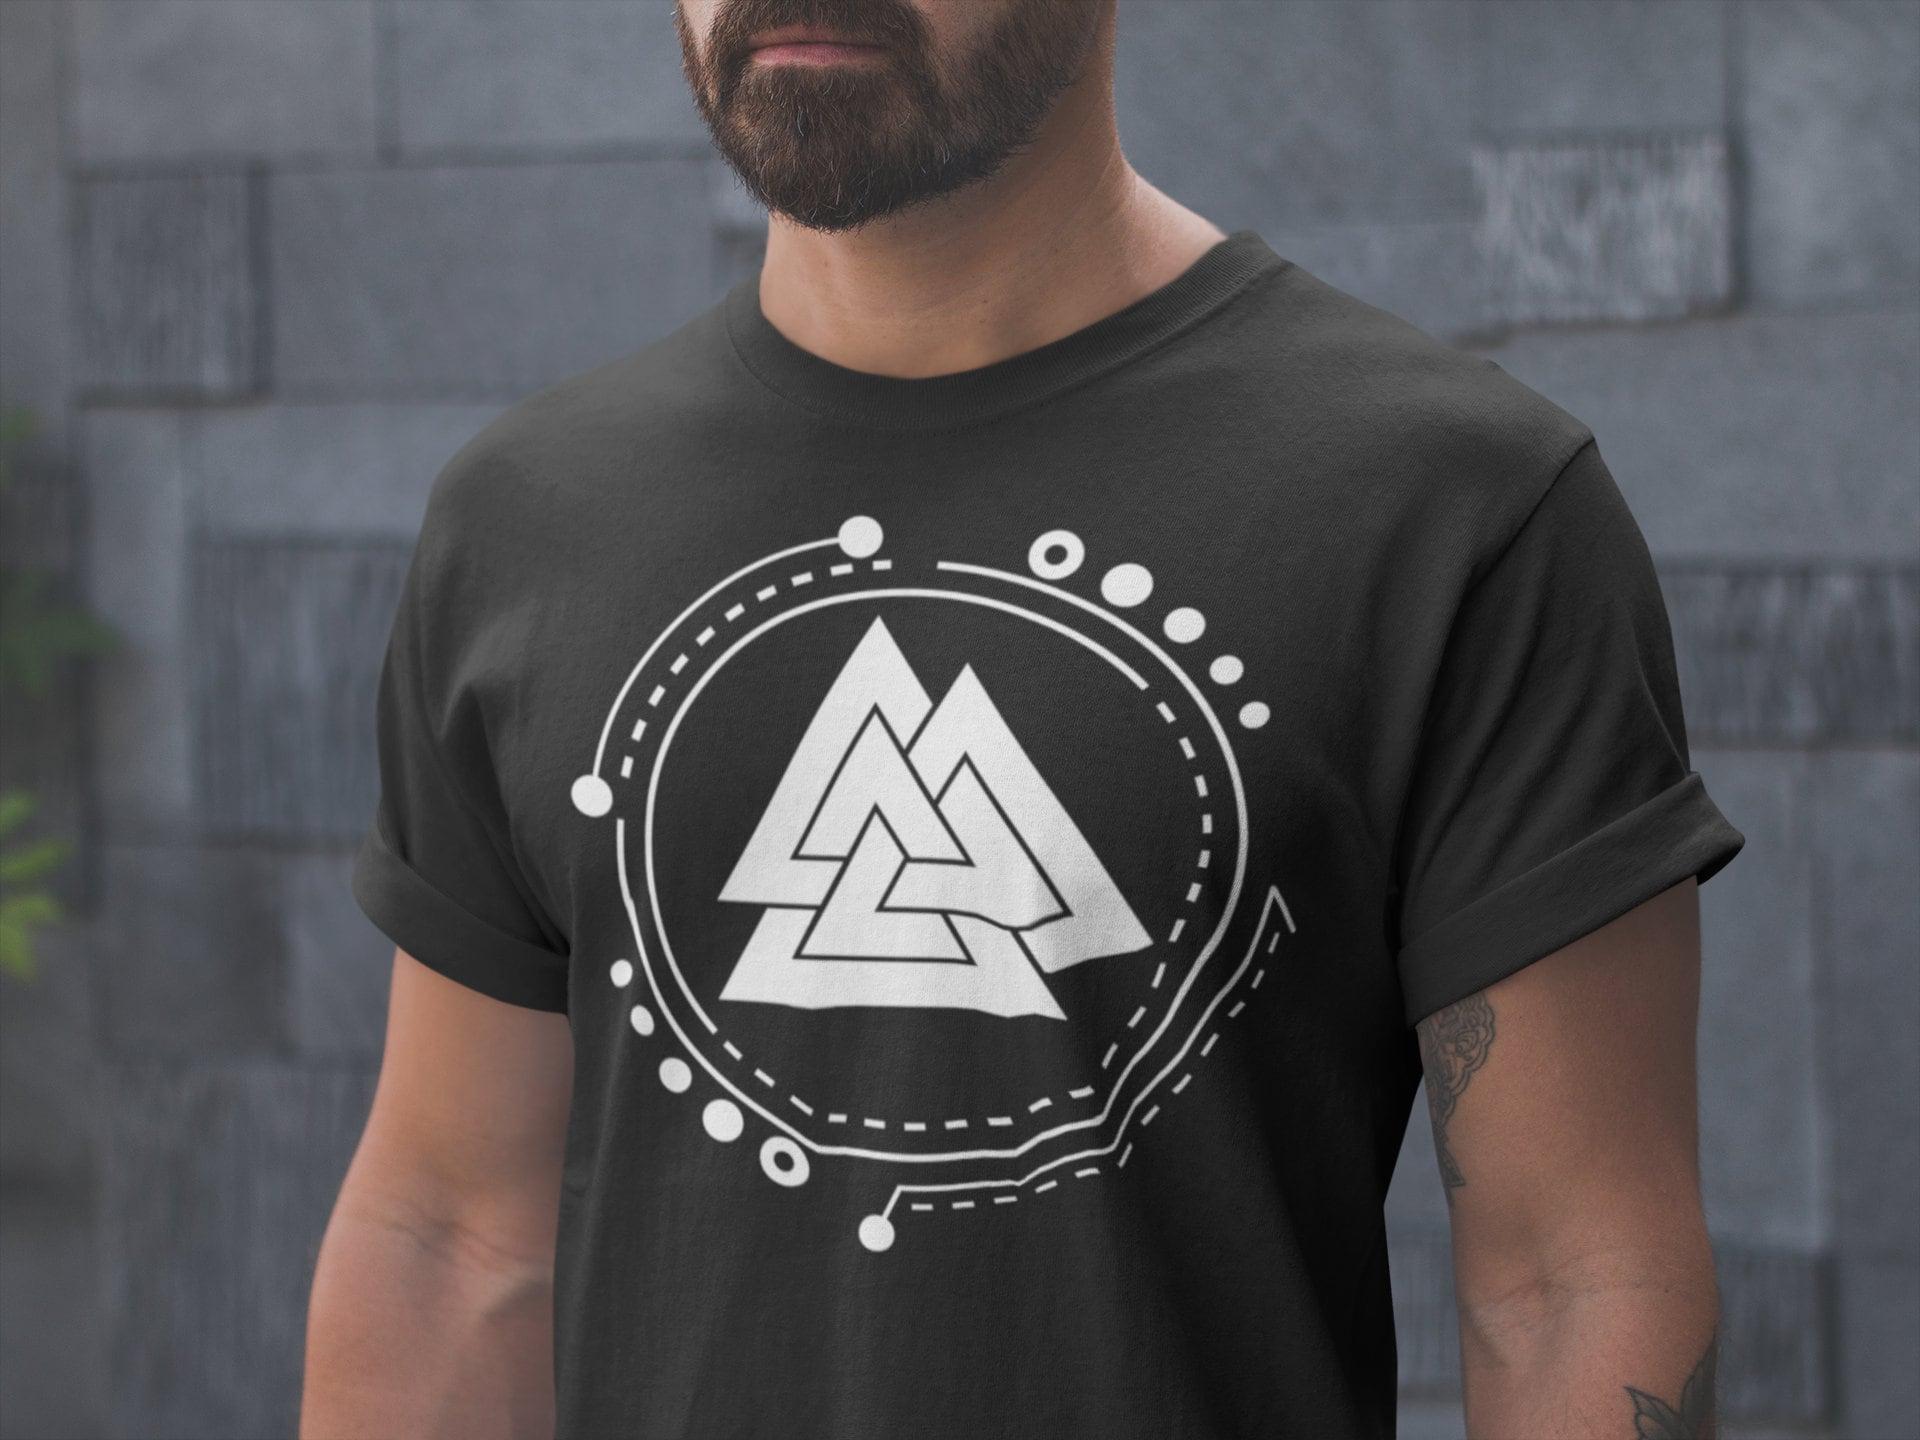 5ea5dca9 Valknut | Norse Pagan Symbol | Viking Sign T-Shirt | 3/4 Raglan ...